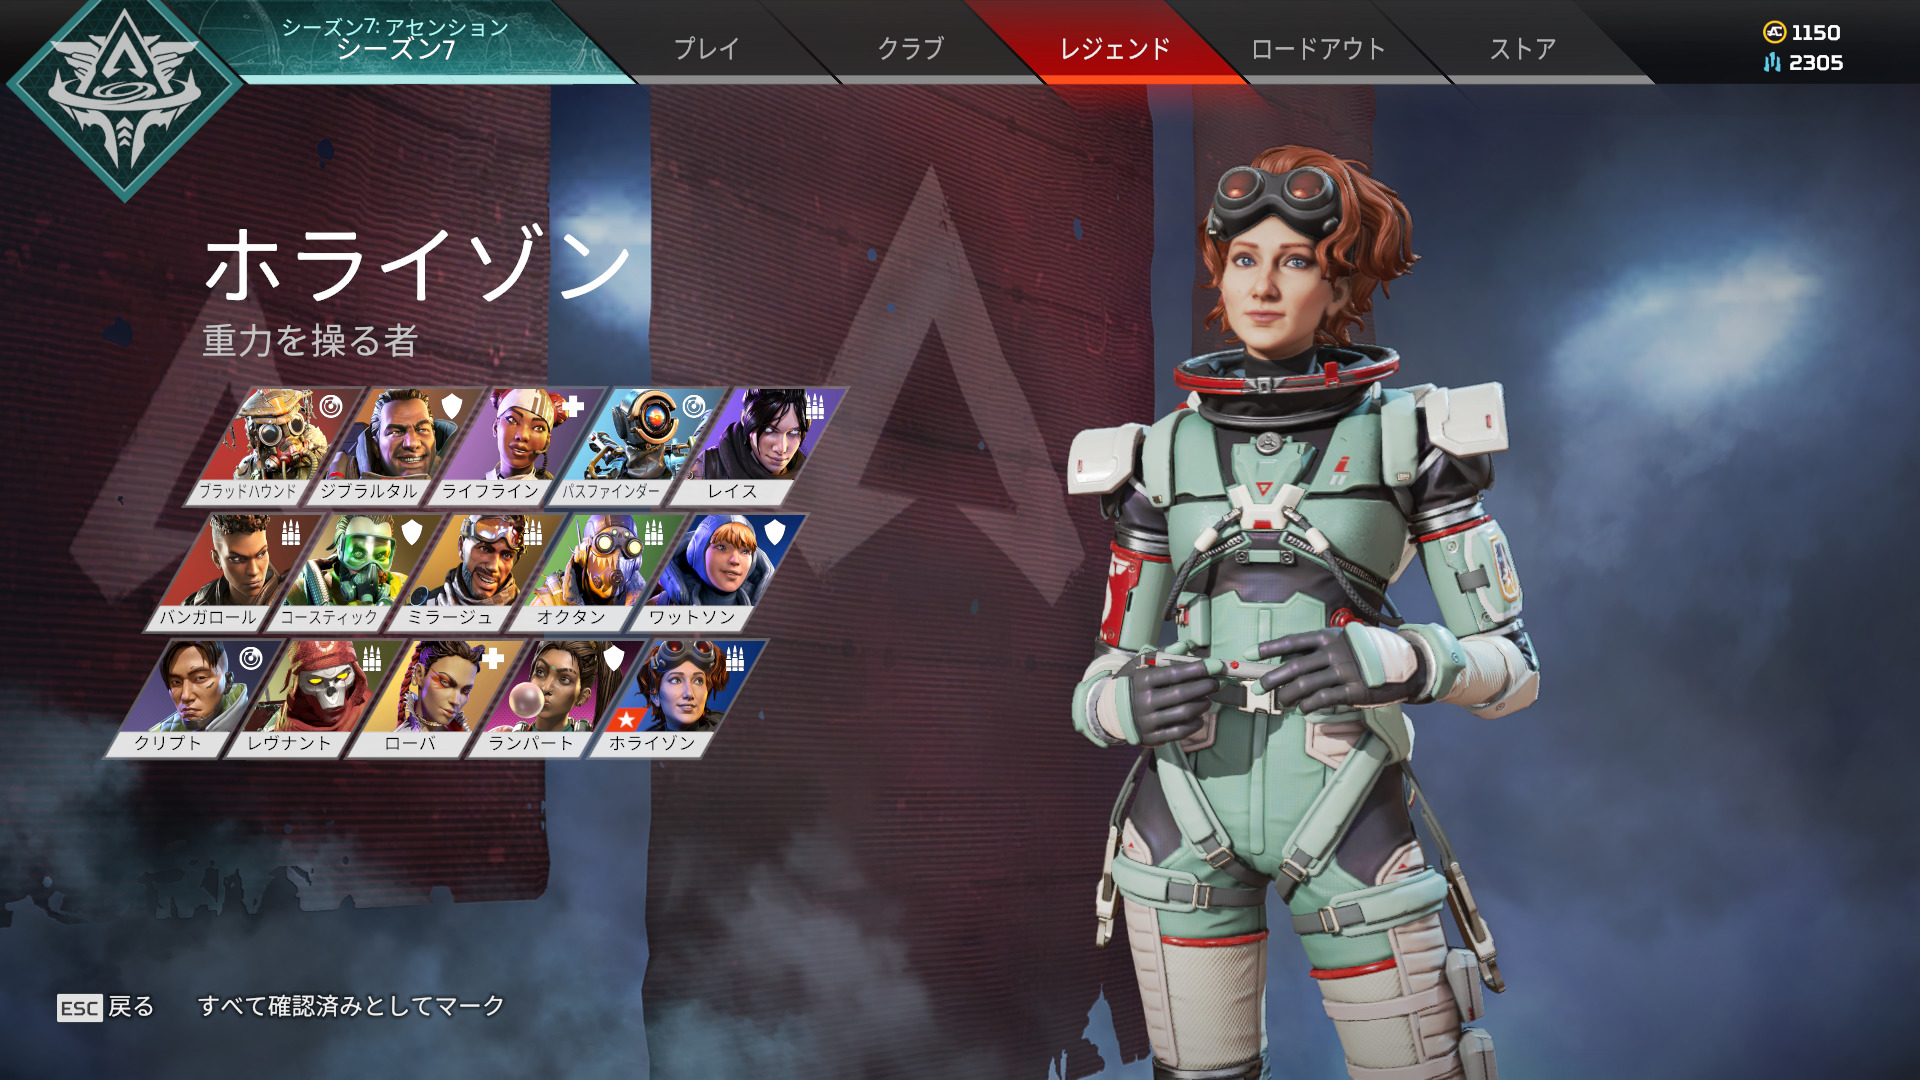 【Apex Legends】ホライゾン 日本語セリフ一覧【基本ボイス】【エーペックスレジェンズ】